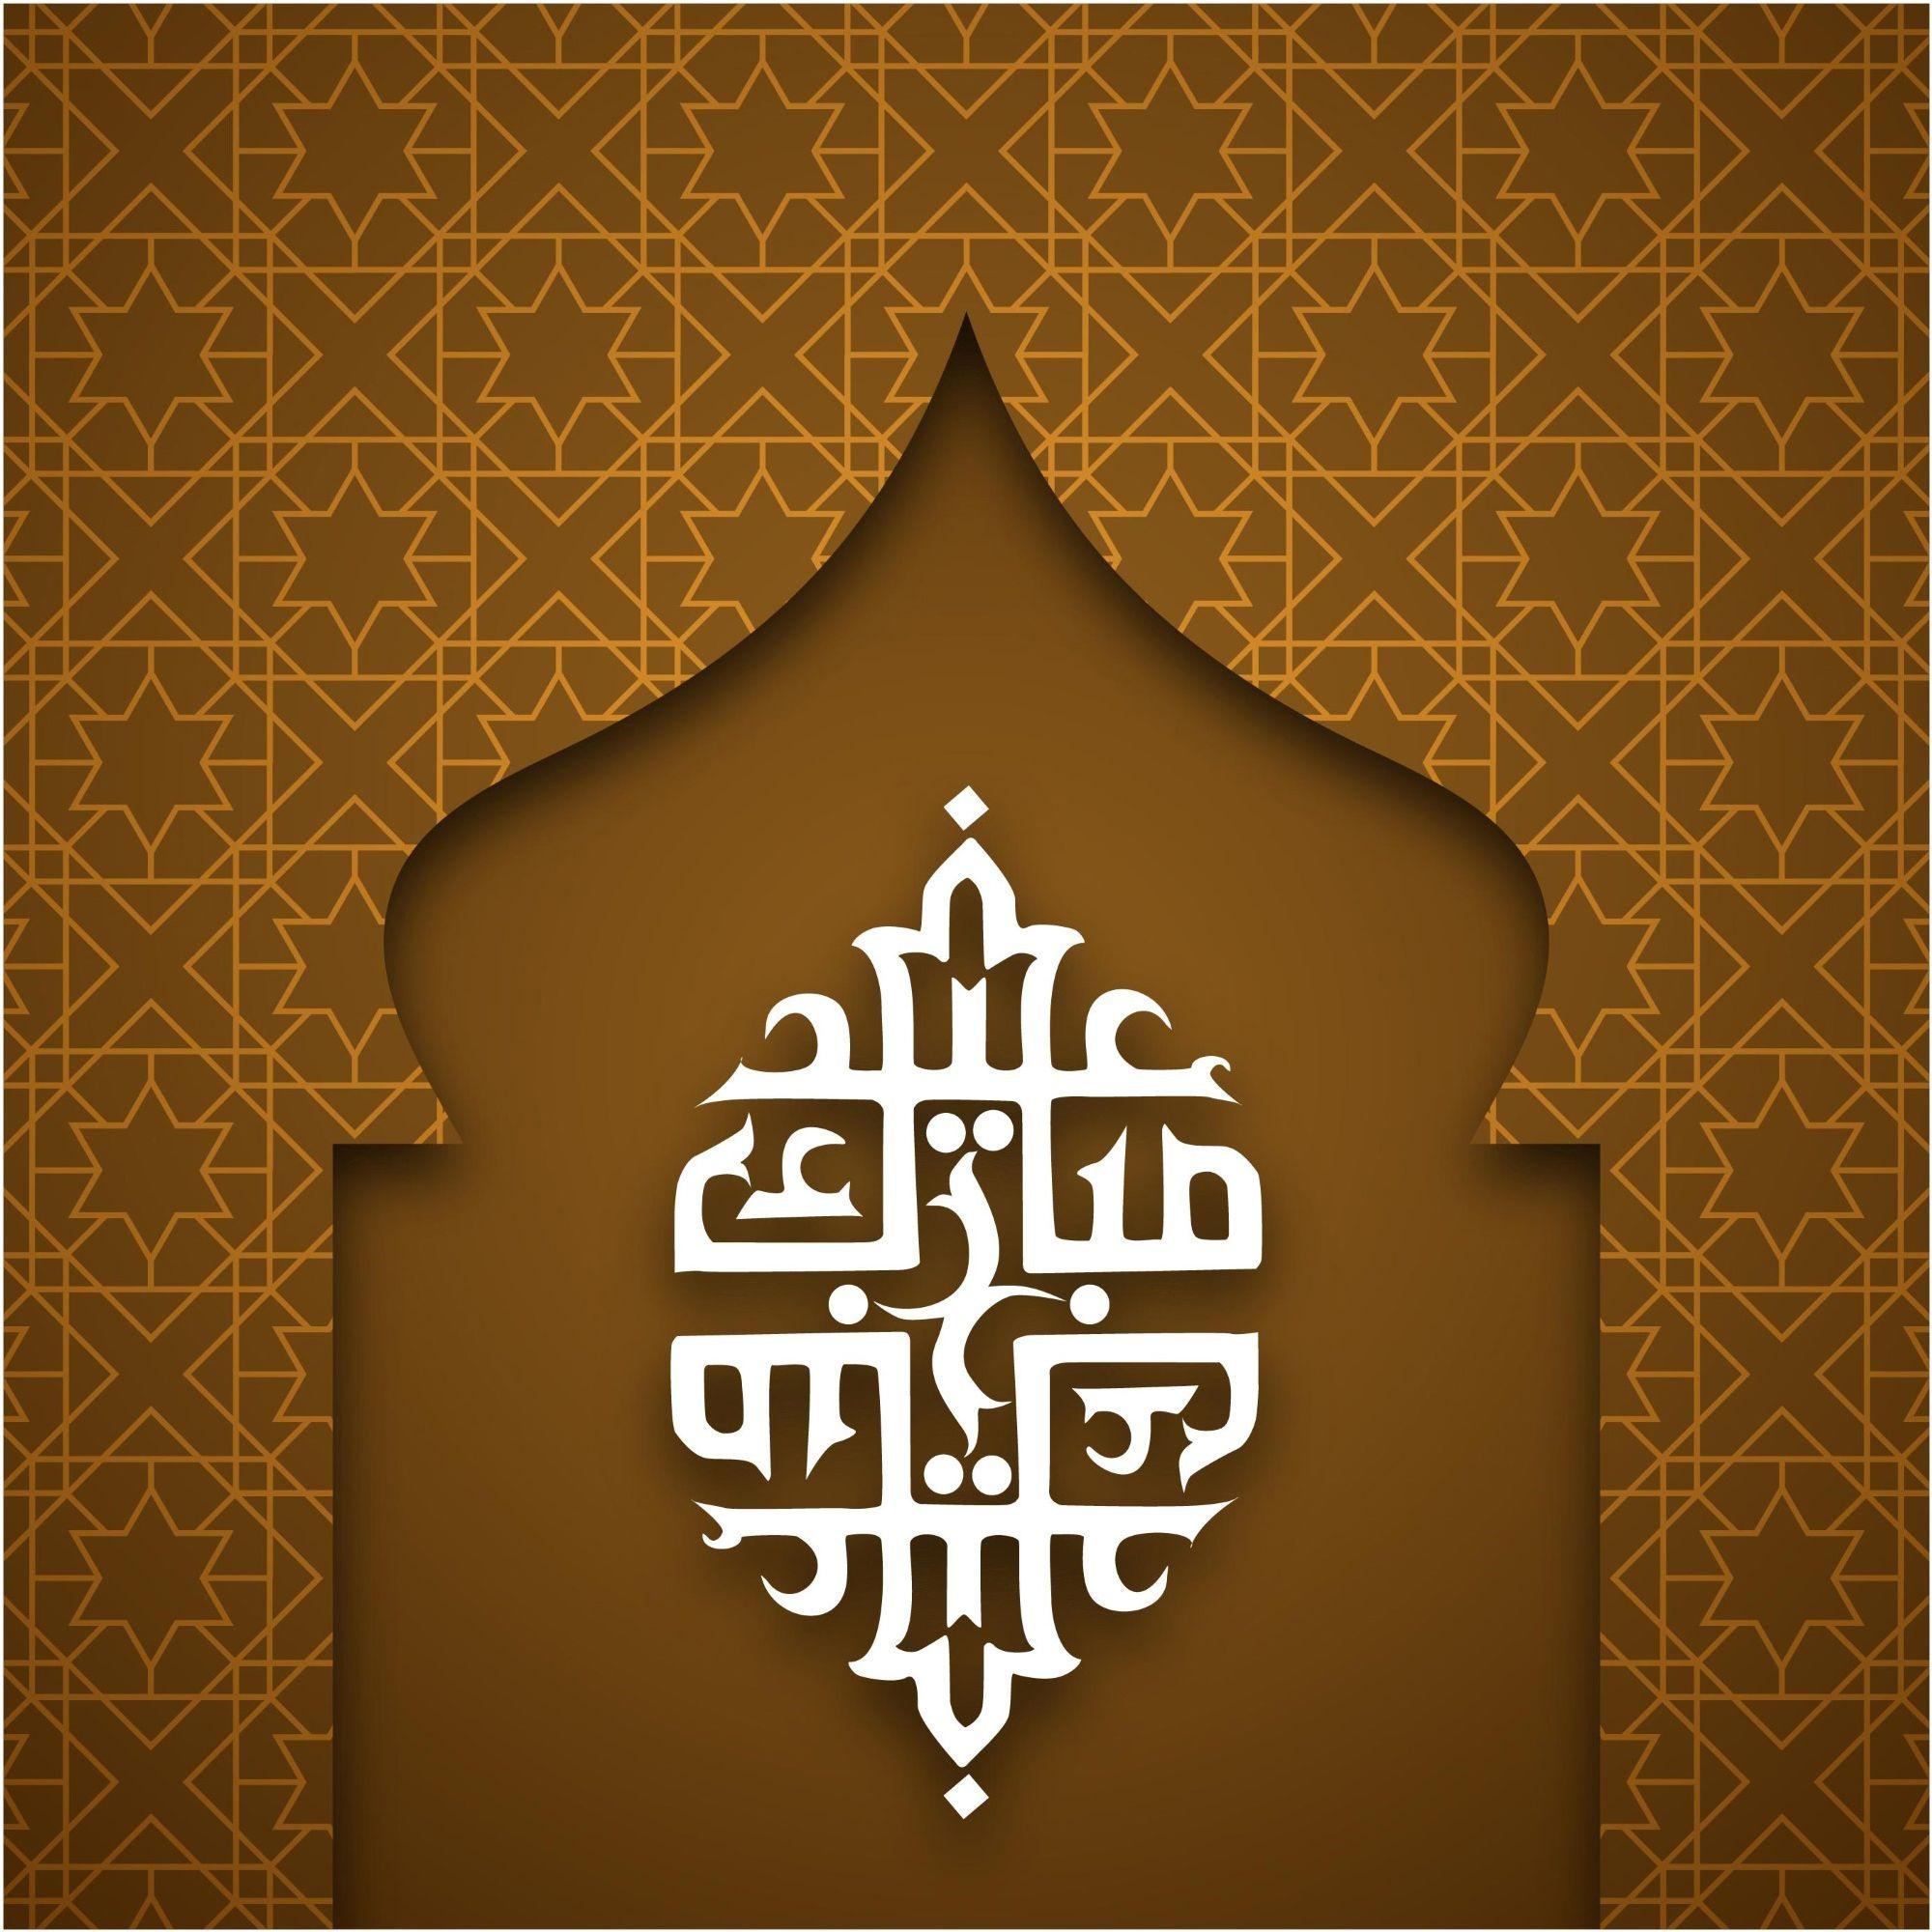 2017 new vector eid mubarak arabic calligraphy eid mubarak 2017 new vector eid mubarak arabic calligraphy kristyandbryce Choice Image